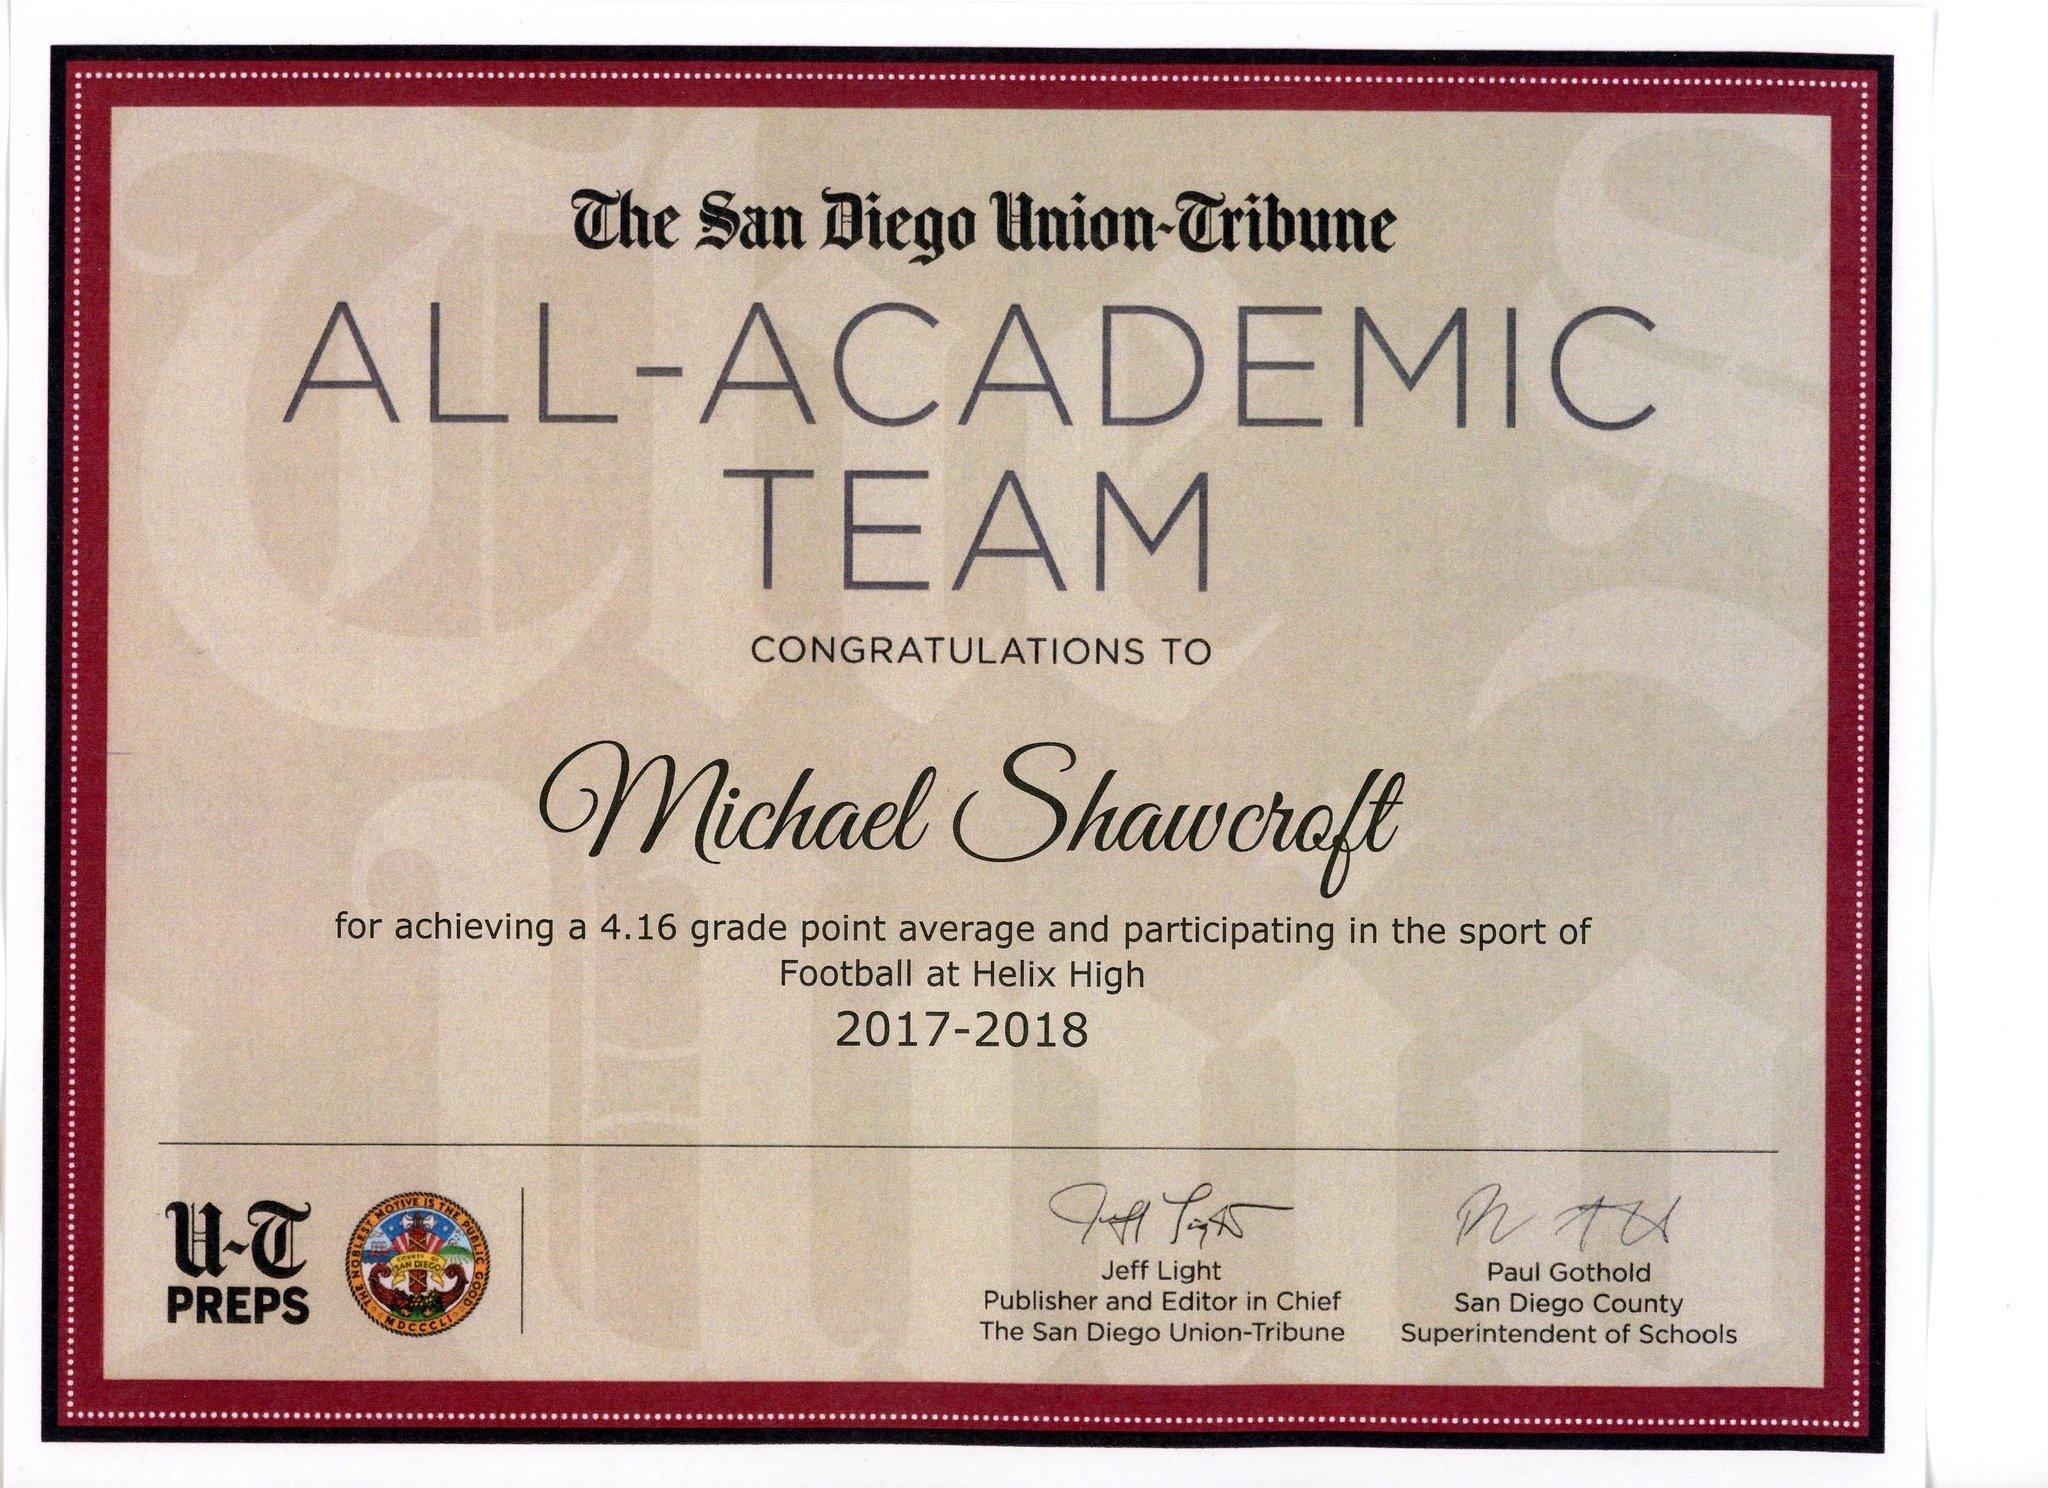 All-Academic Team certificate 2017-18